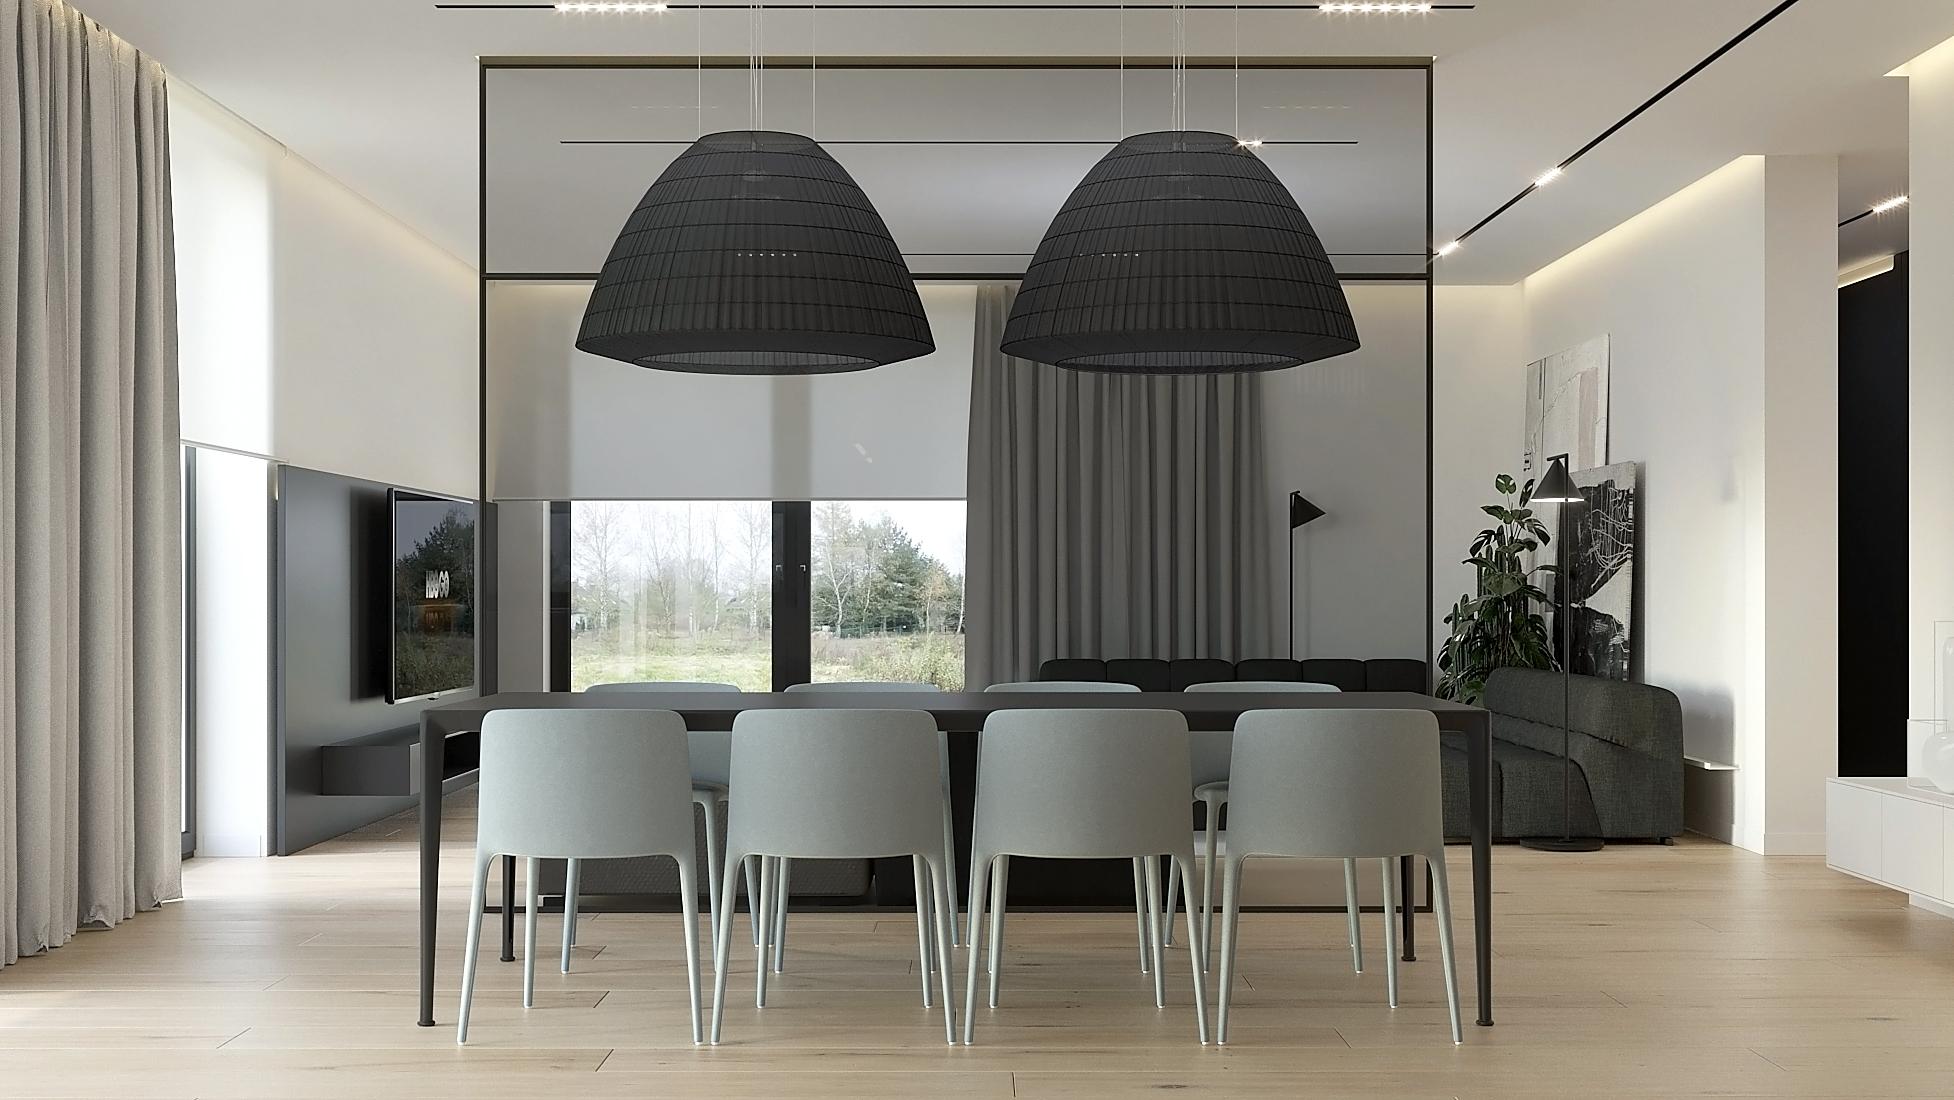 13 projket wnetrz D555 dom Libertow jadalnia duzy stol szare krzesla lampy na stolem czarne abazury